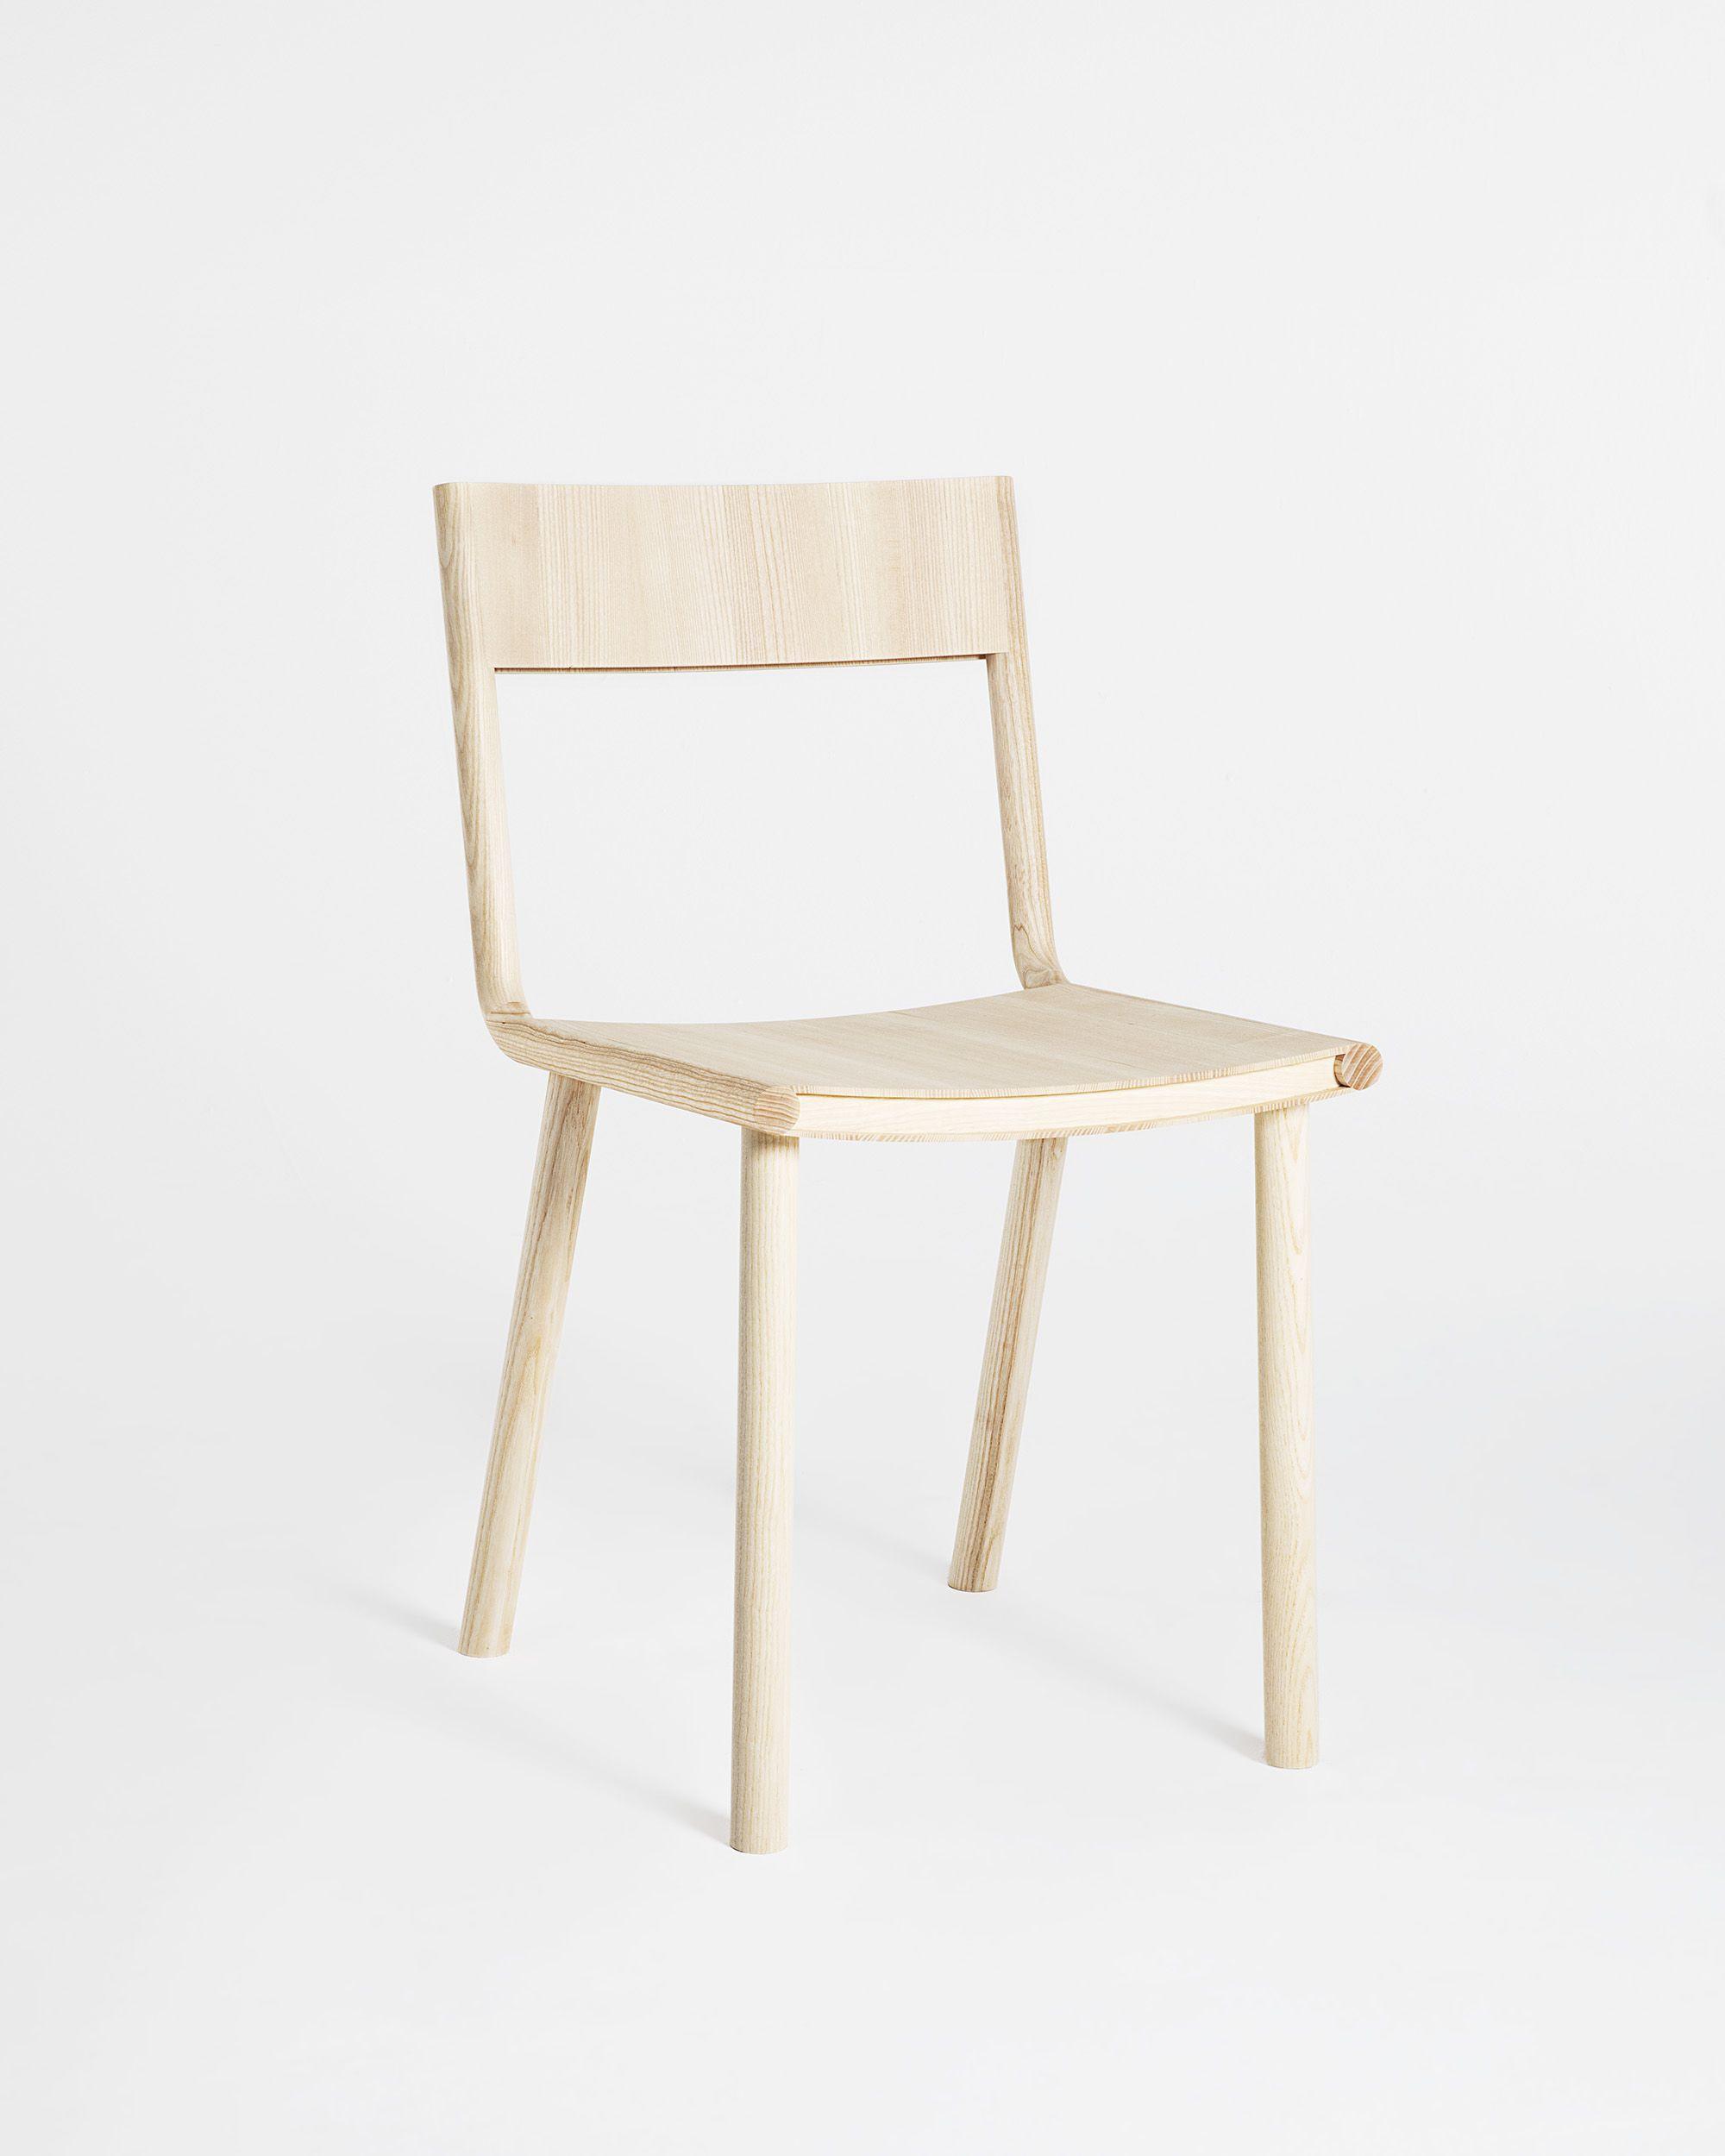 Chair Design Wooden, Chair